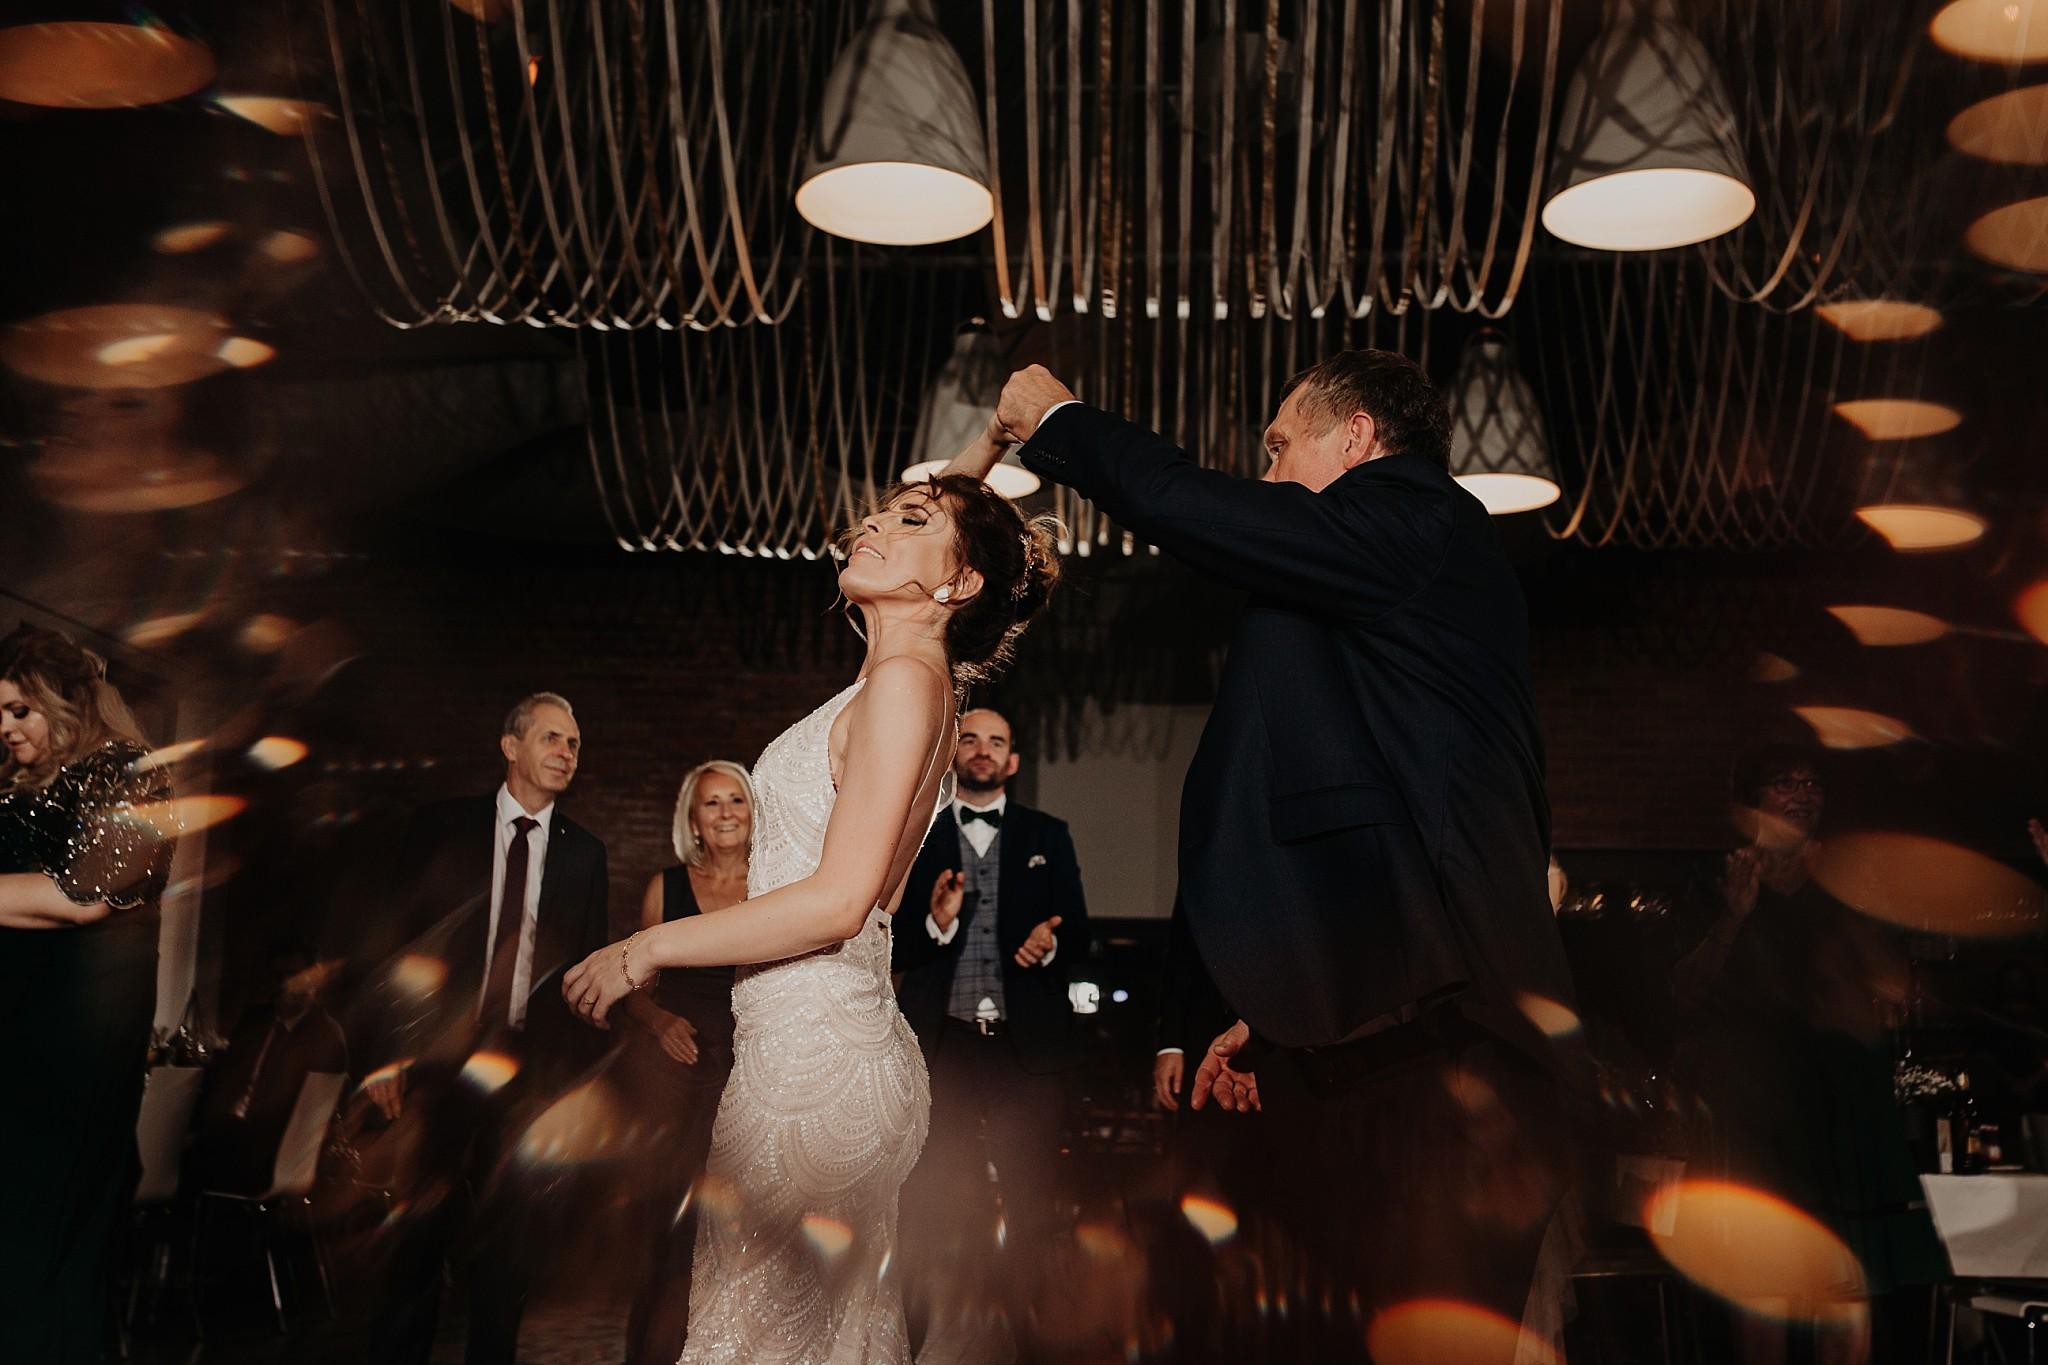 fotograf poznan wesele dobra truskawka piekne wesele pod poznaniem wesele w dobrej truskawce piekna para mloda slub marzen slub koronawirus slub listopad wesele koronawirus 395